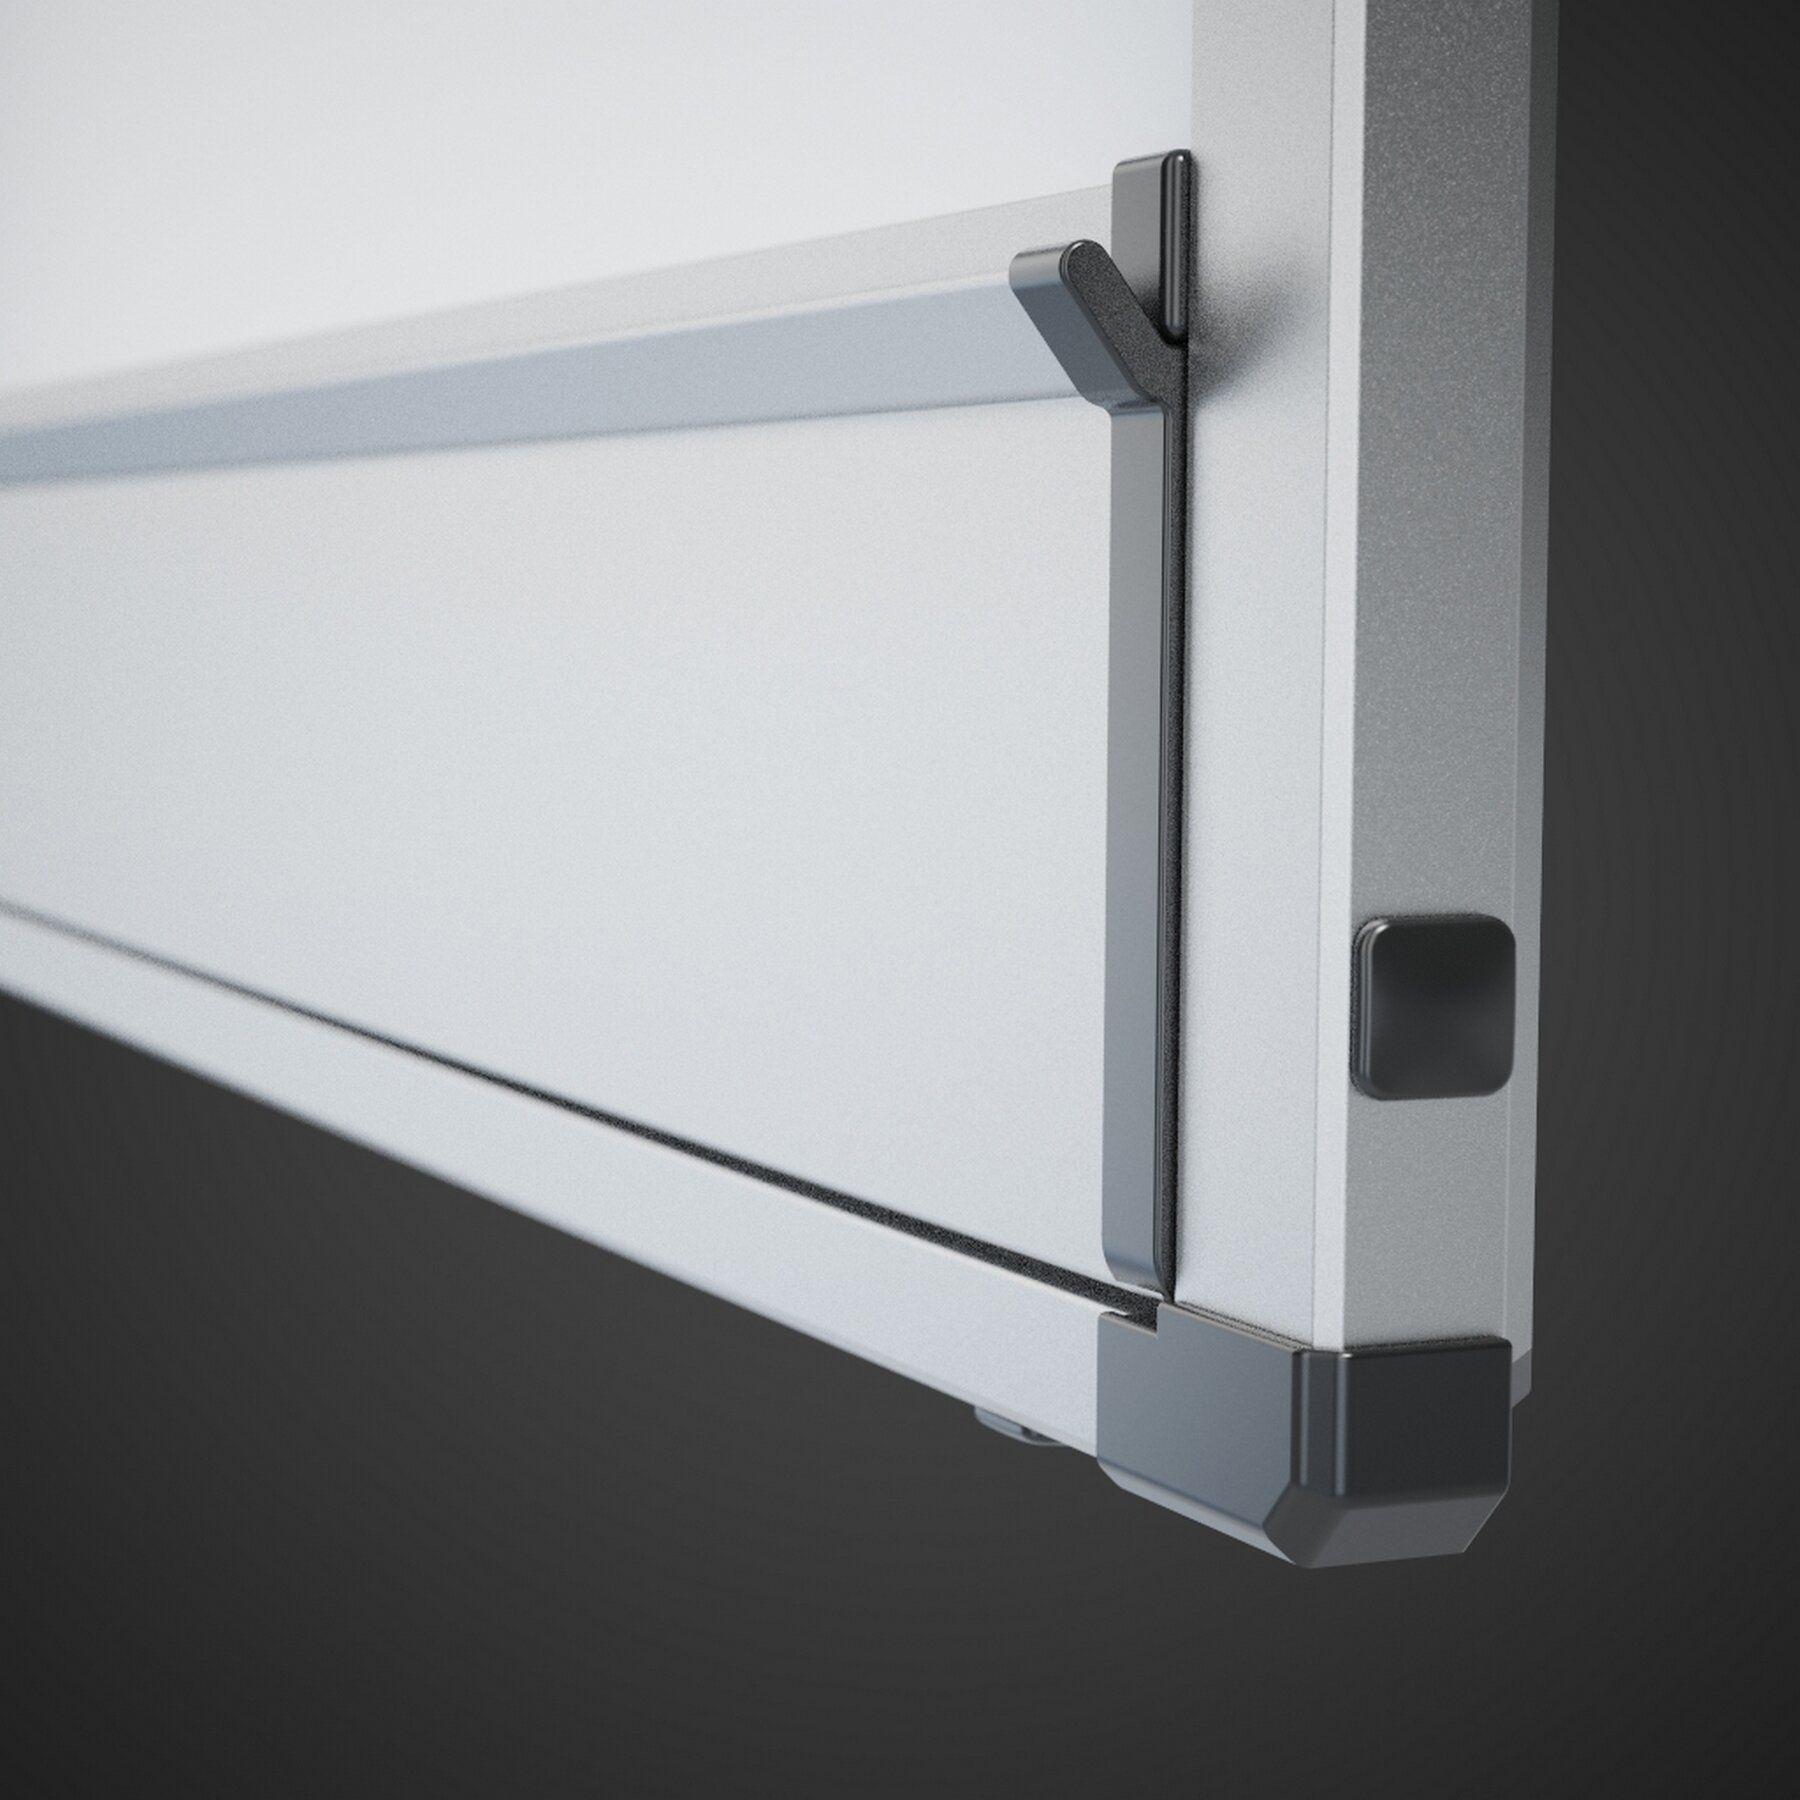 Доска белая магнитная сухостираемая StarBoard 100*150см., алюминиевая рамка, керамика 2x3 - фото 2